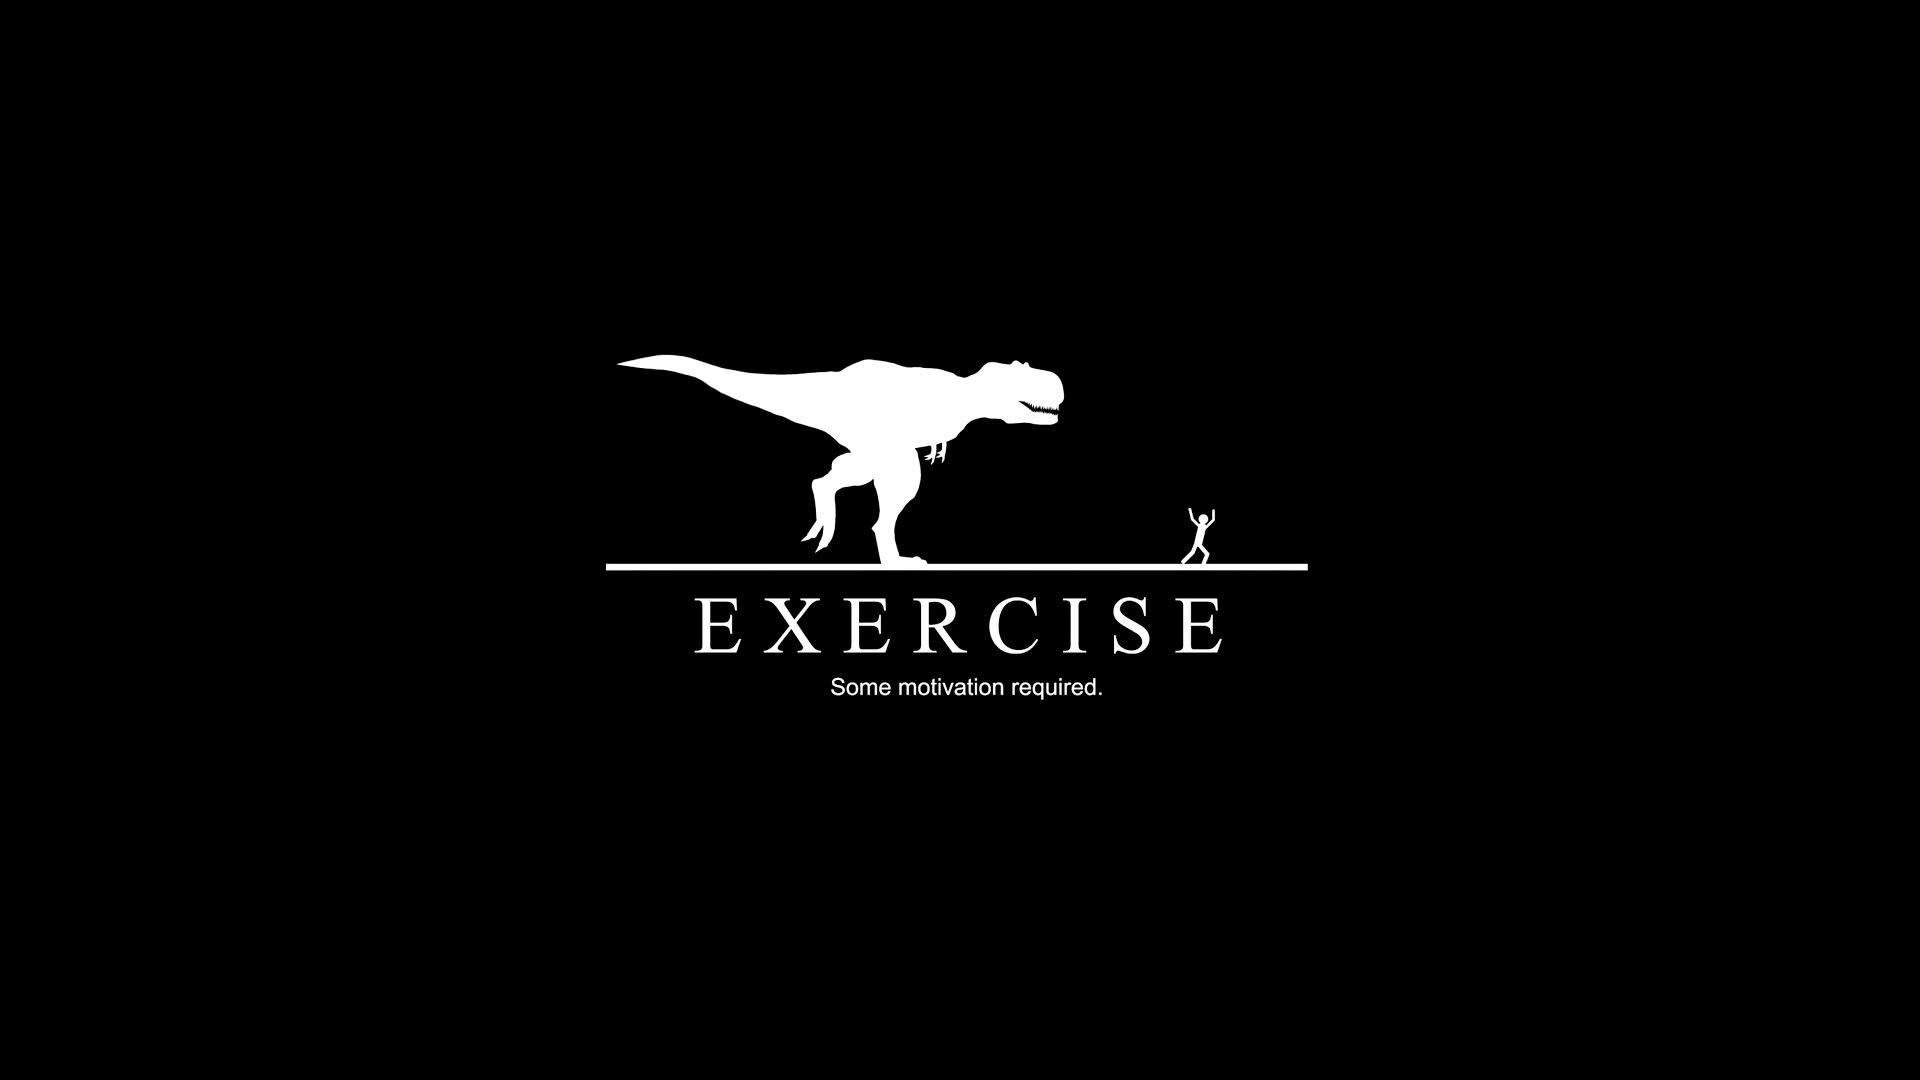 1980x1200 Fitness Motivation Wallpaper For Girls | GET STRONG NOT SKINNY